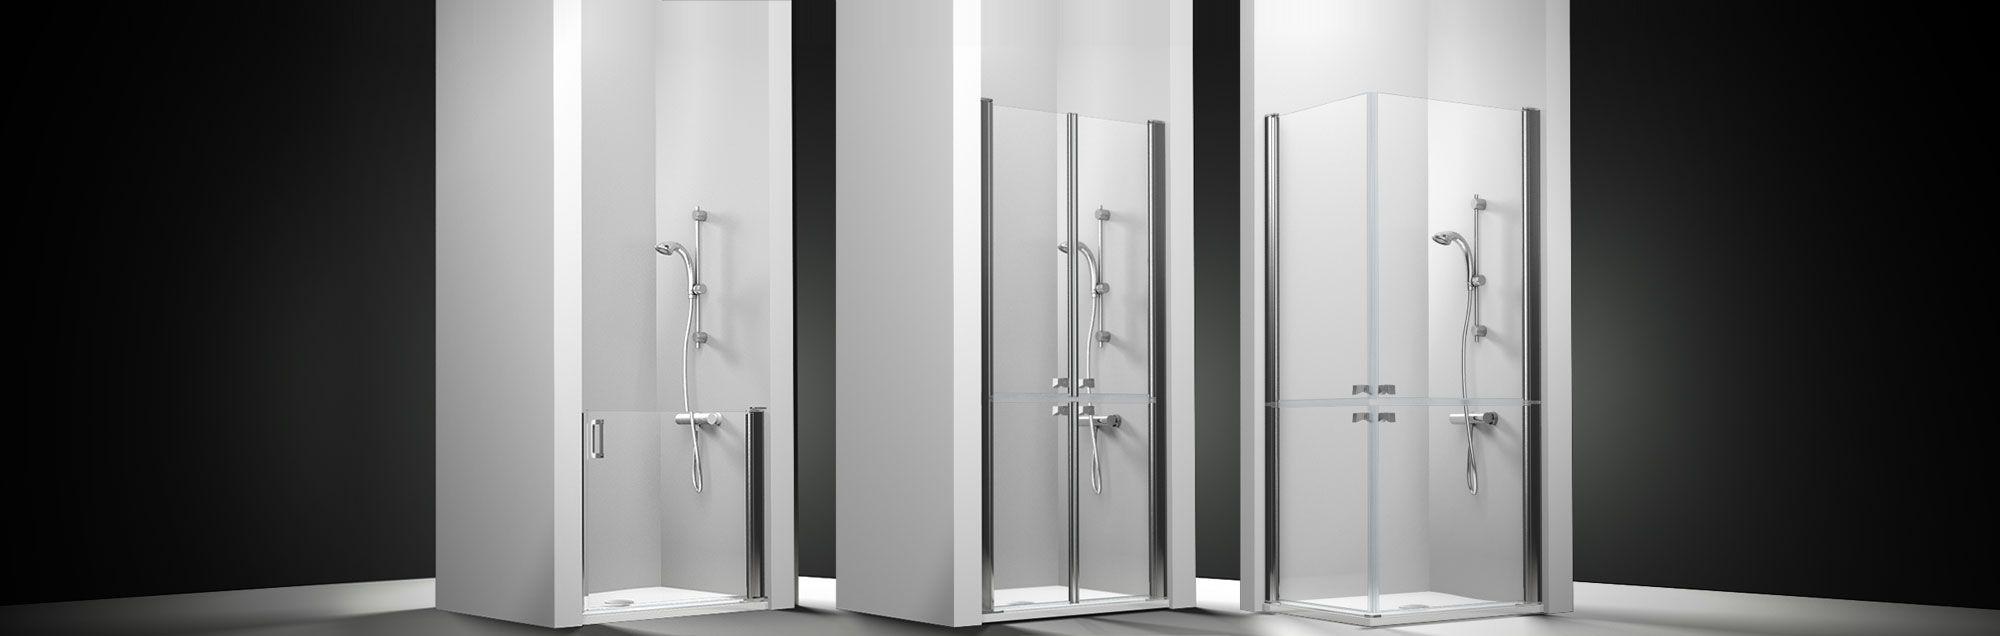 Mamparas pmr asistencial de profiltek para ducha - Profiltek mamparas de bano ...